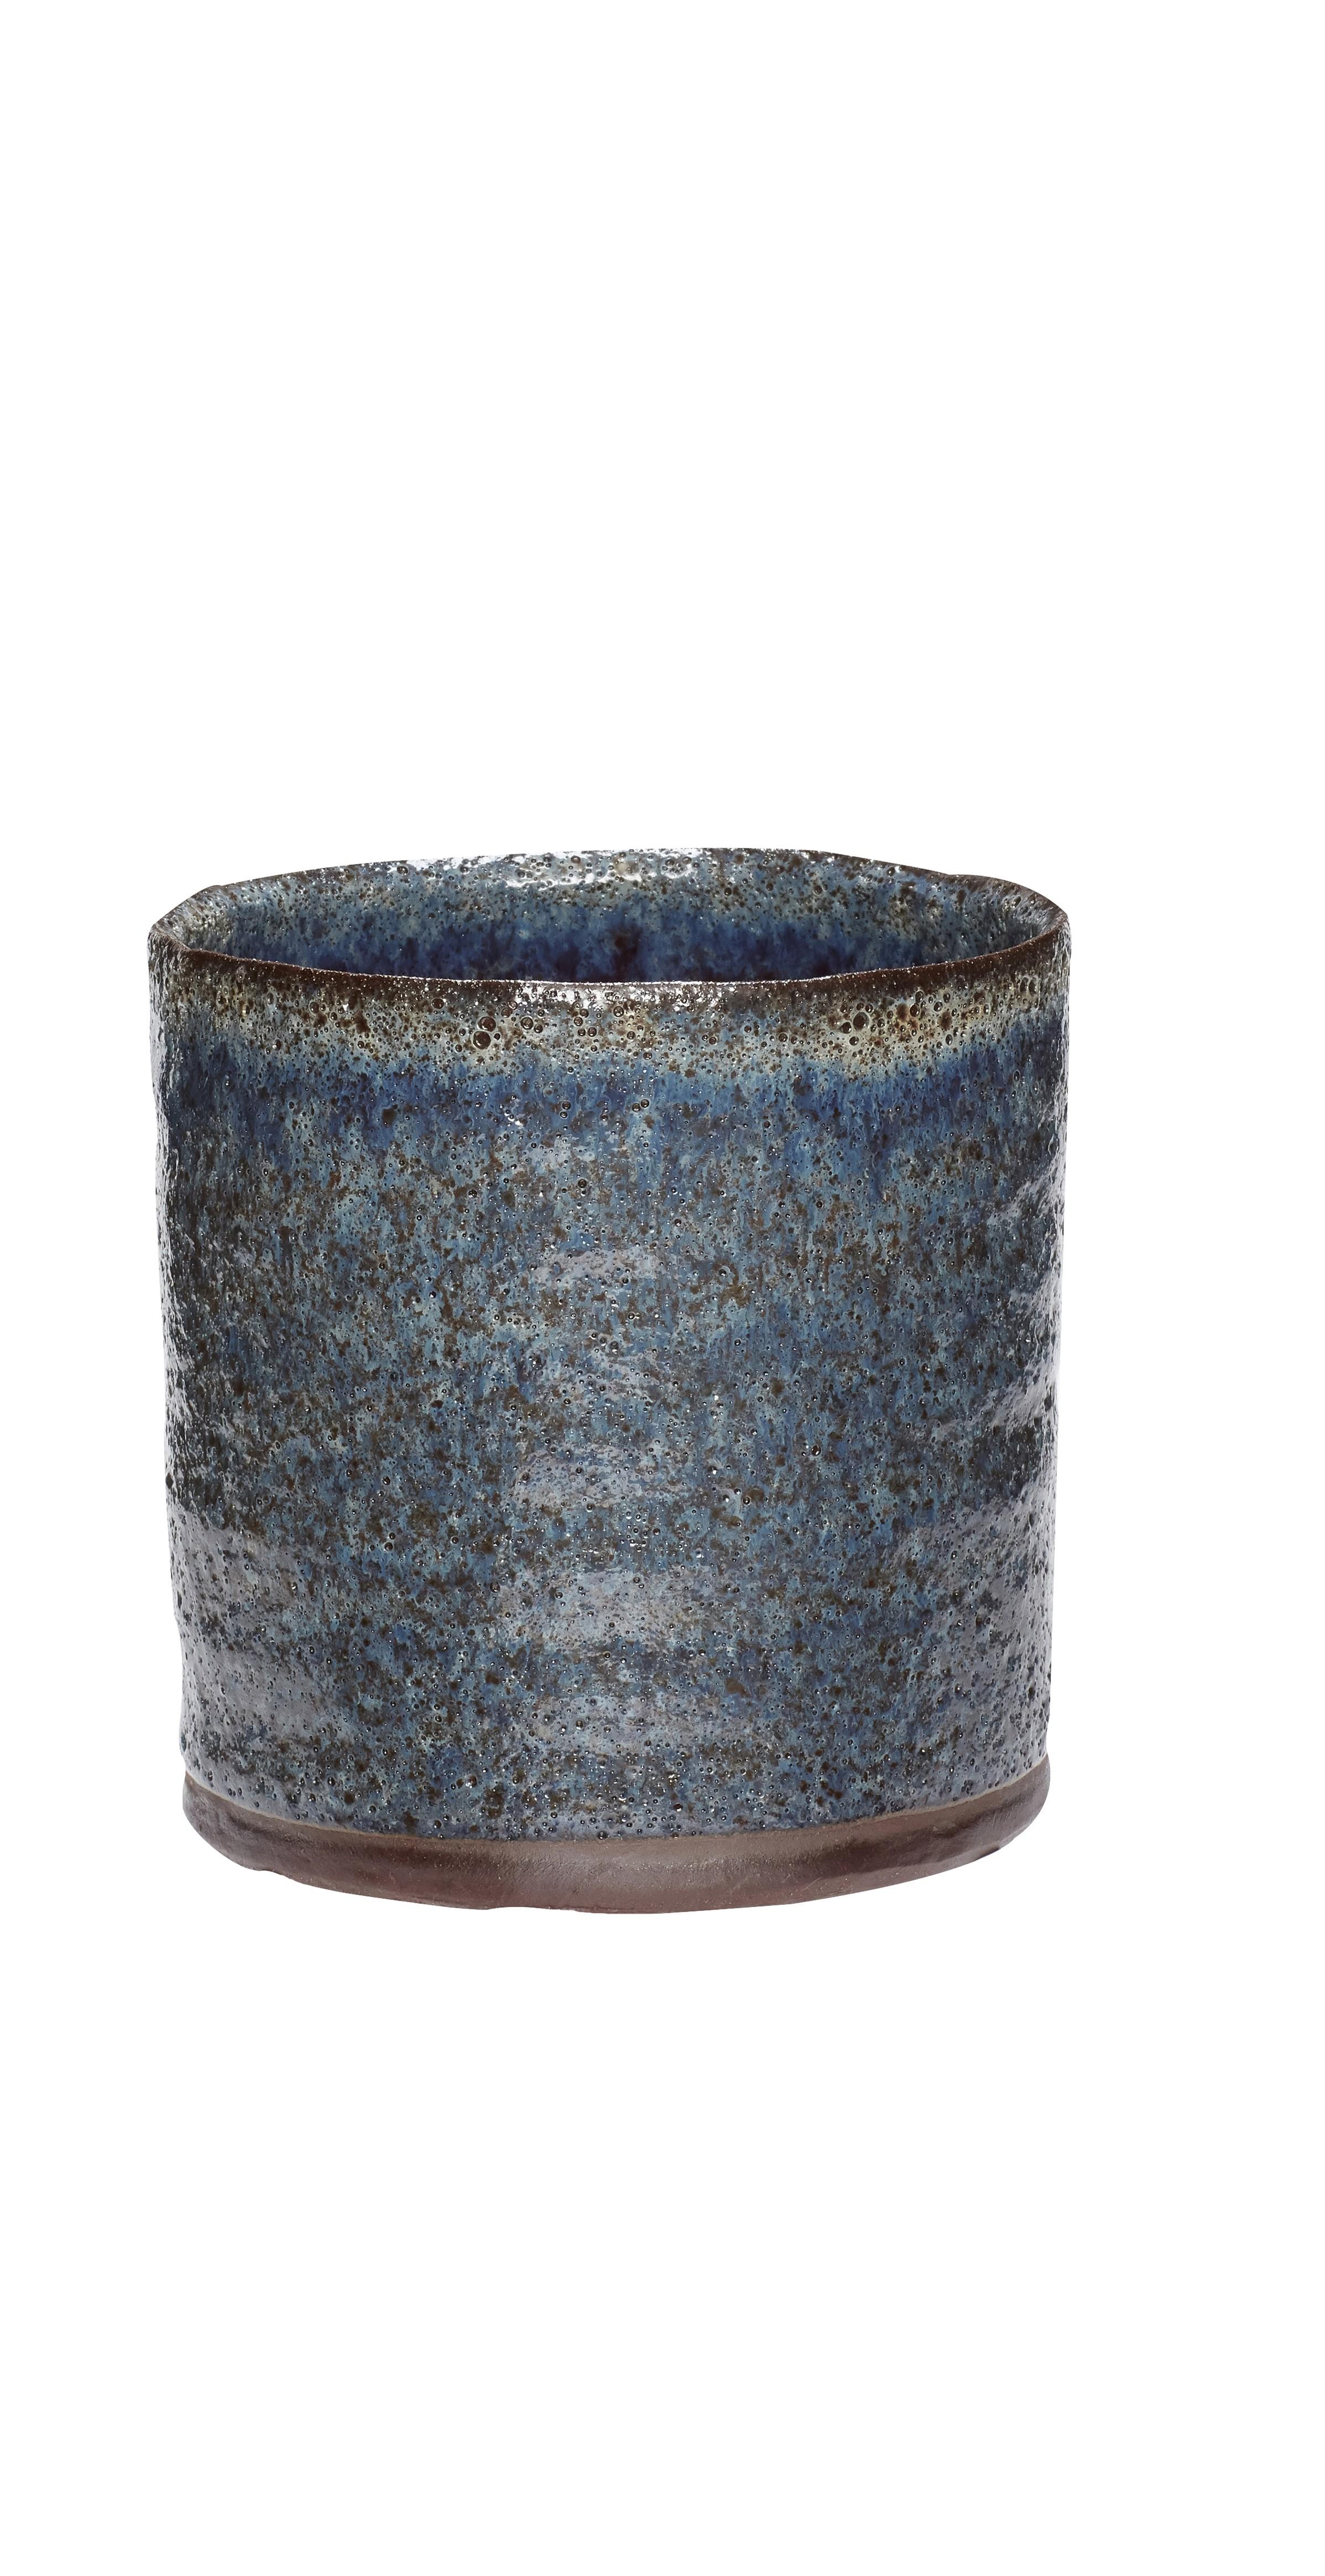 Plant pot Mixed Textured blue & green